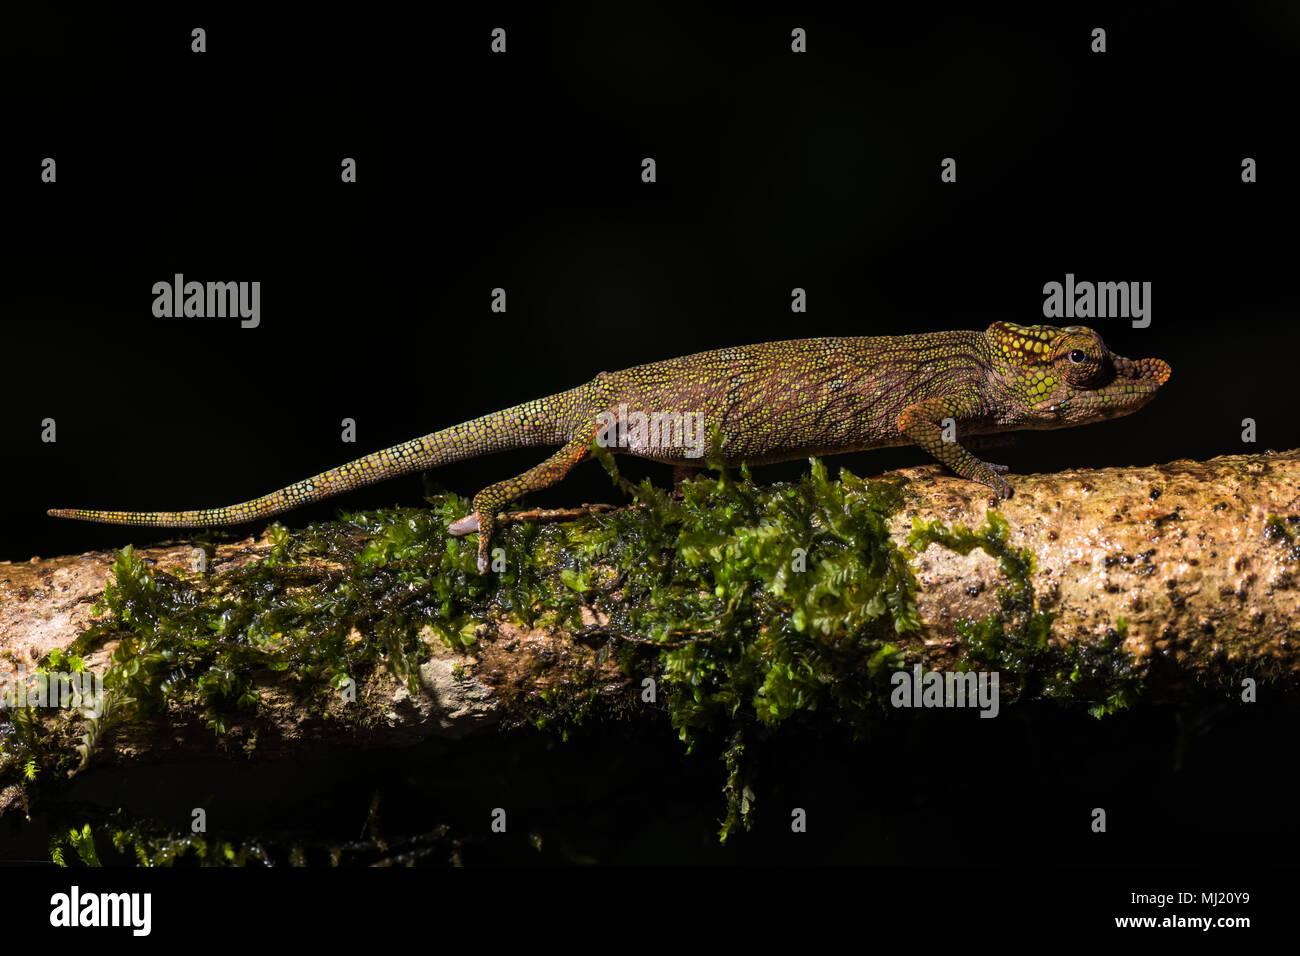 Calumma nasutum (Calumma nasutum), male on mossy branch, Andasibe National Park, Madagascar - Stock Image